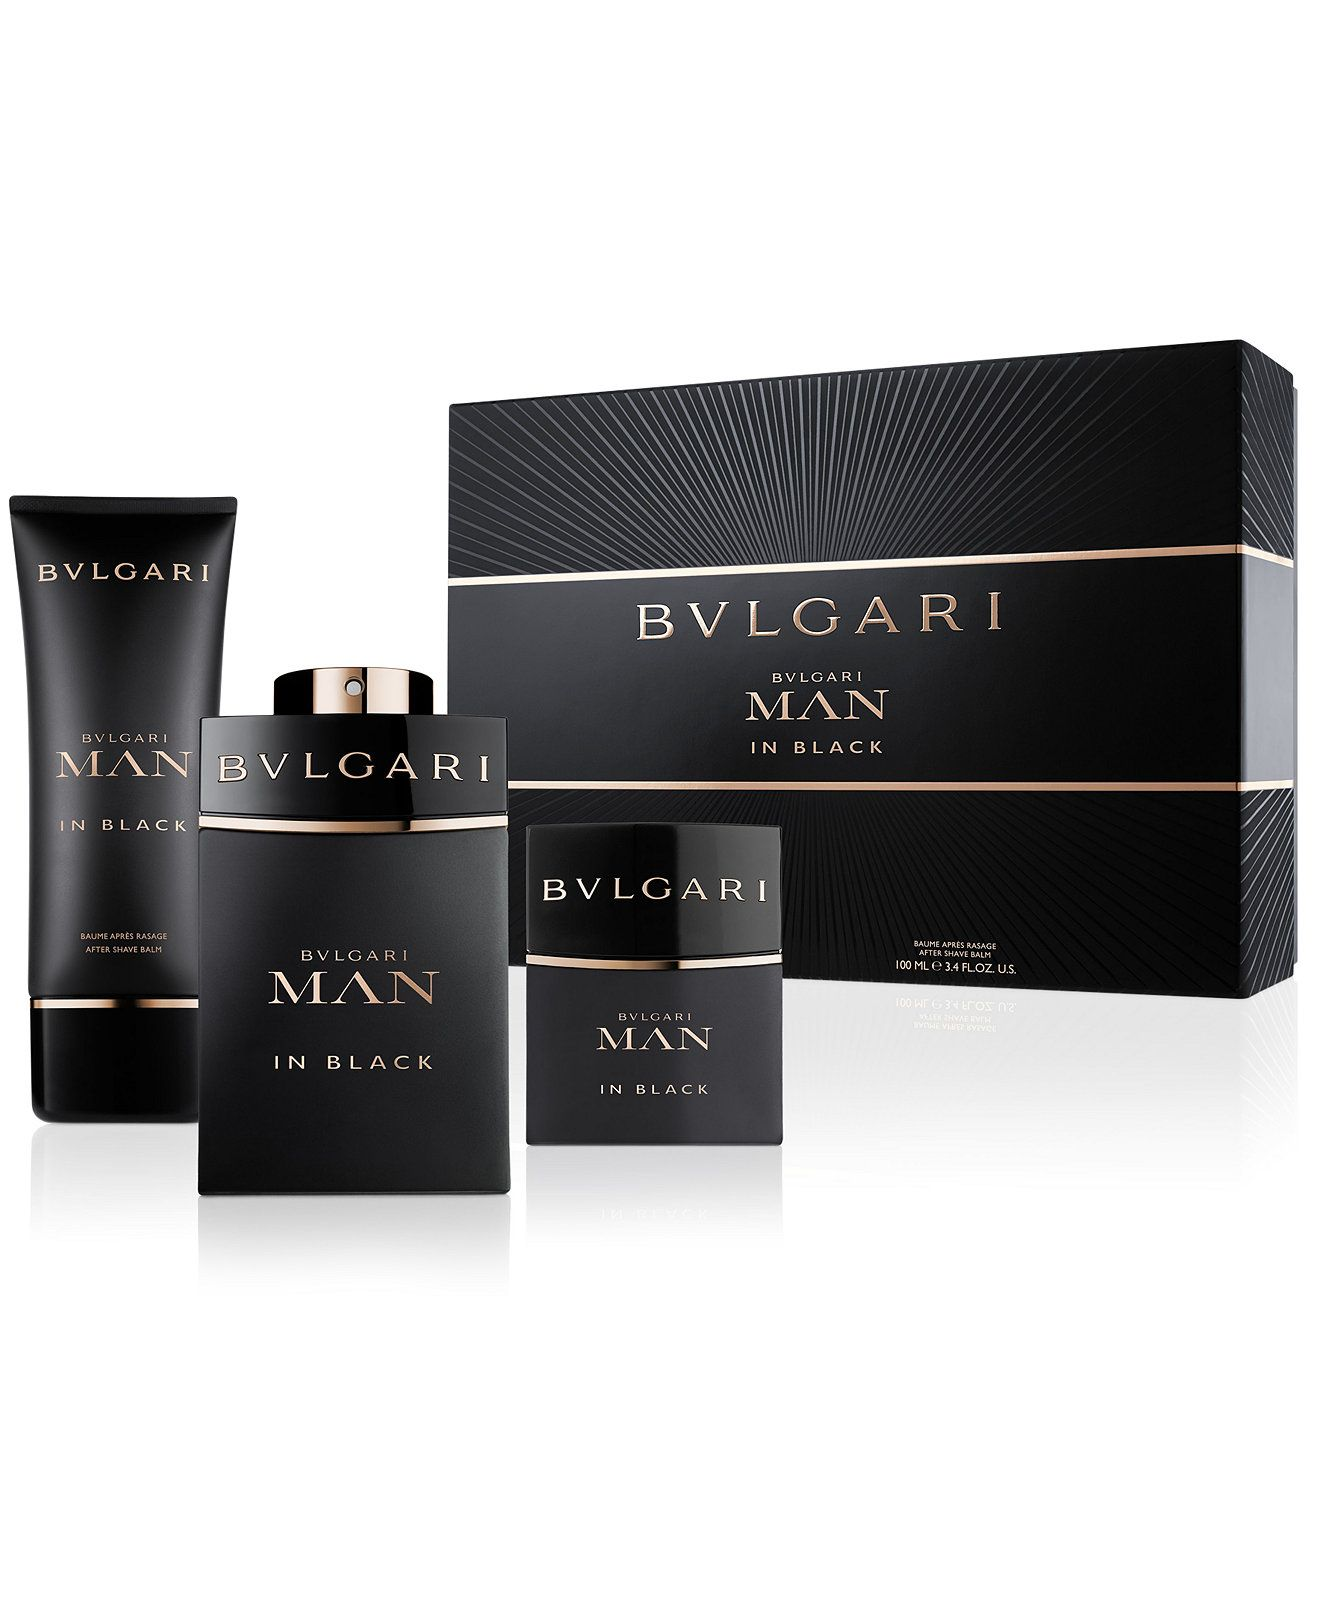 Bvlgari Man In Black Premium Gift Set Shop All Brands Beauty Macy S Bvlgari Man In Black Bvlgari Fragrance Best Perfume For Men